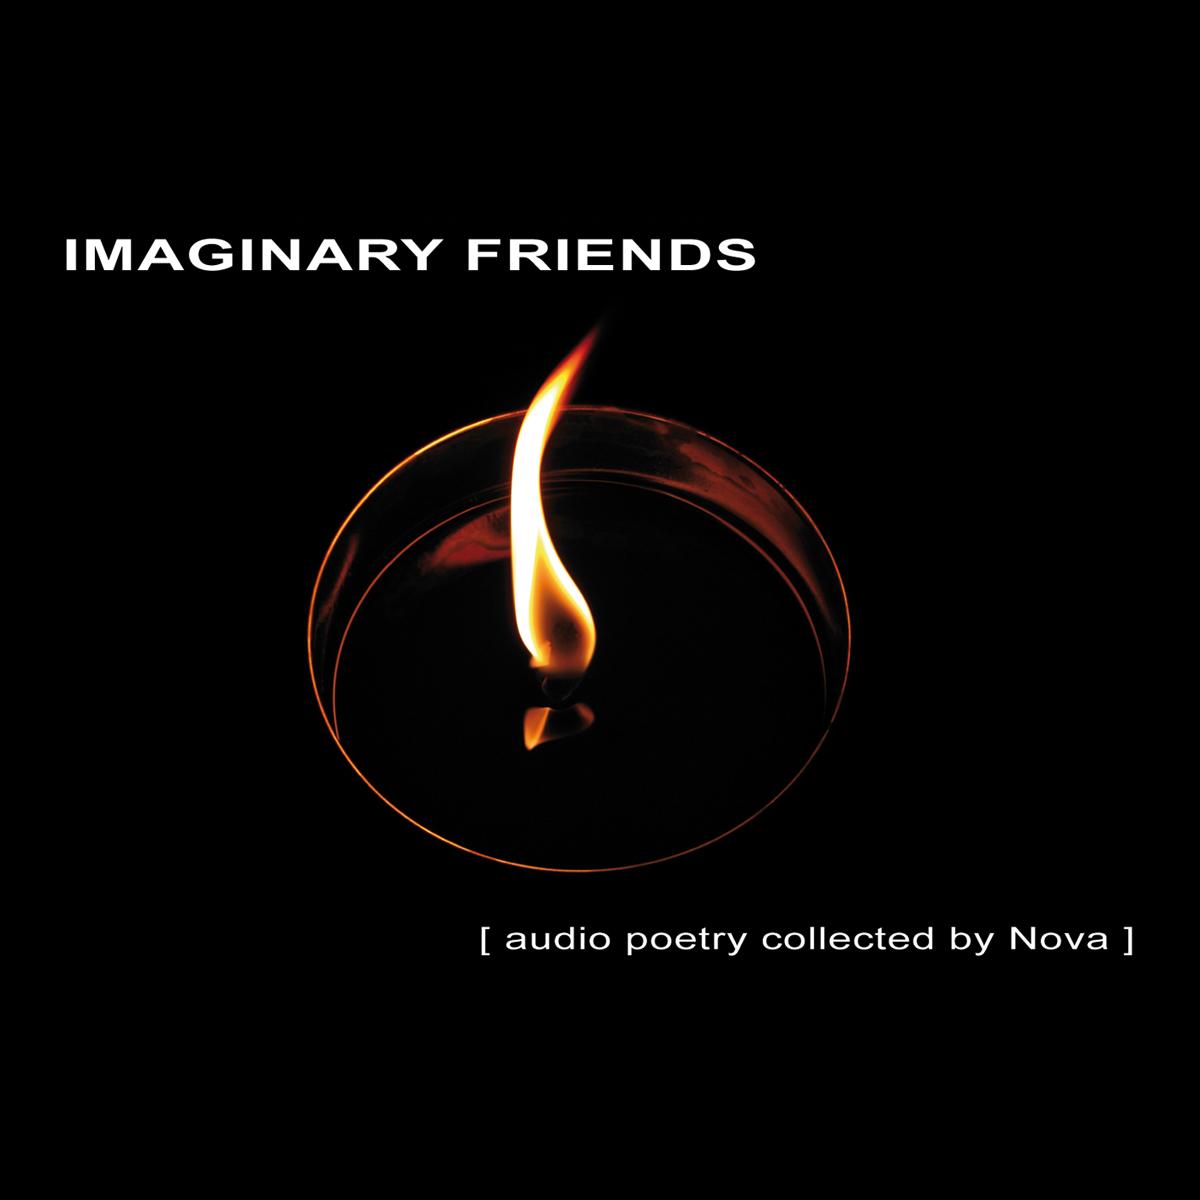 nova imaginary friends